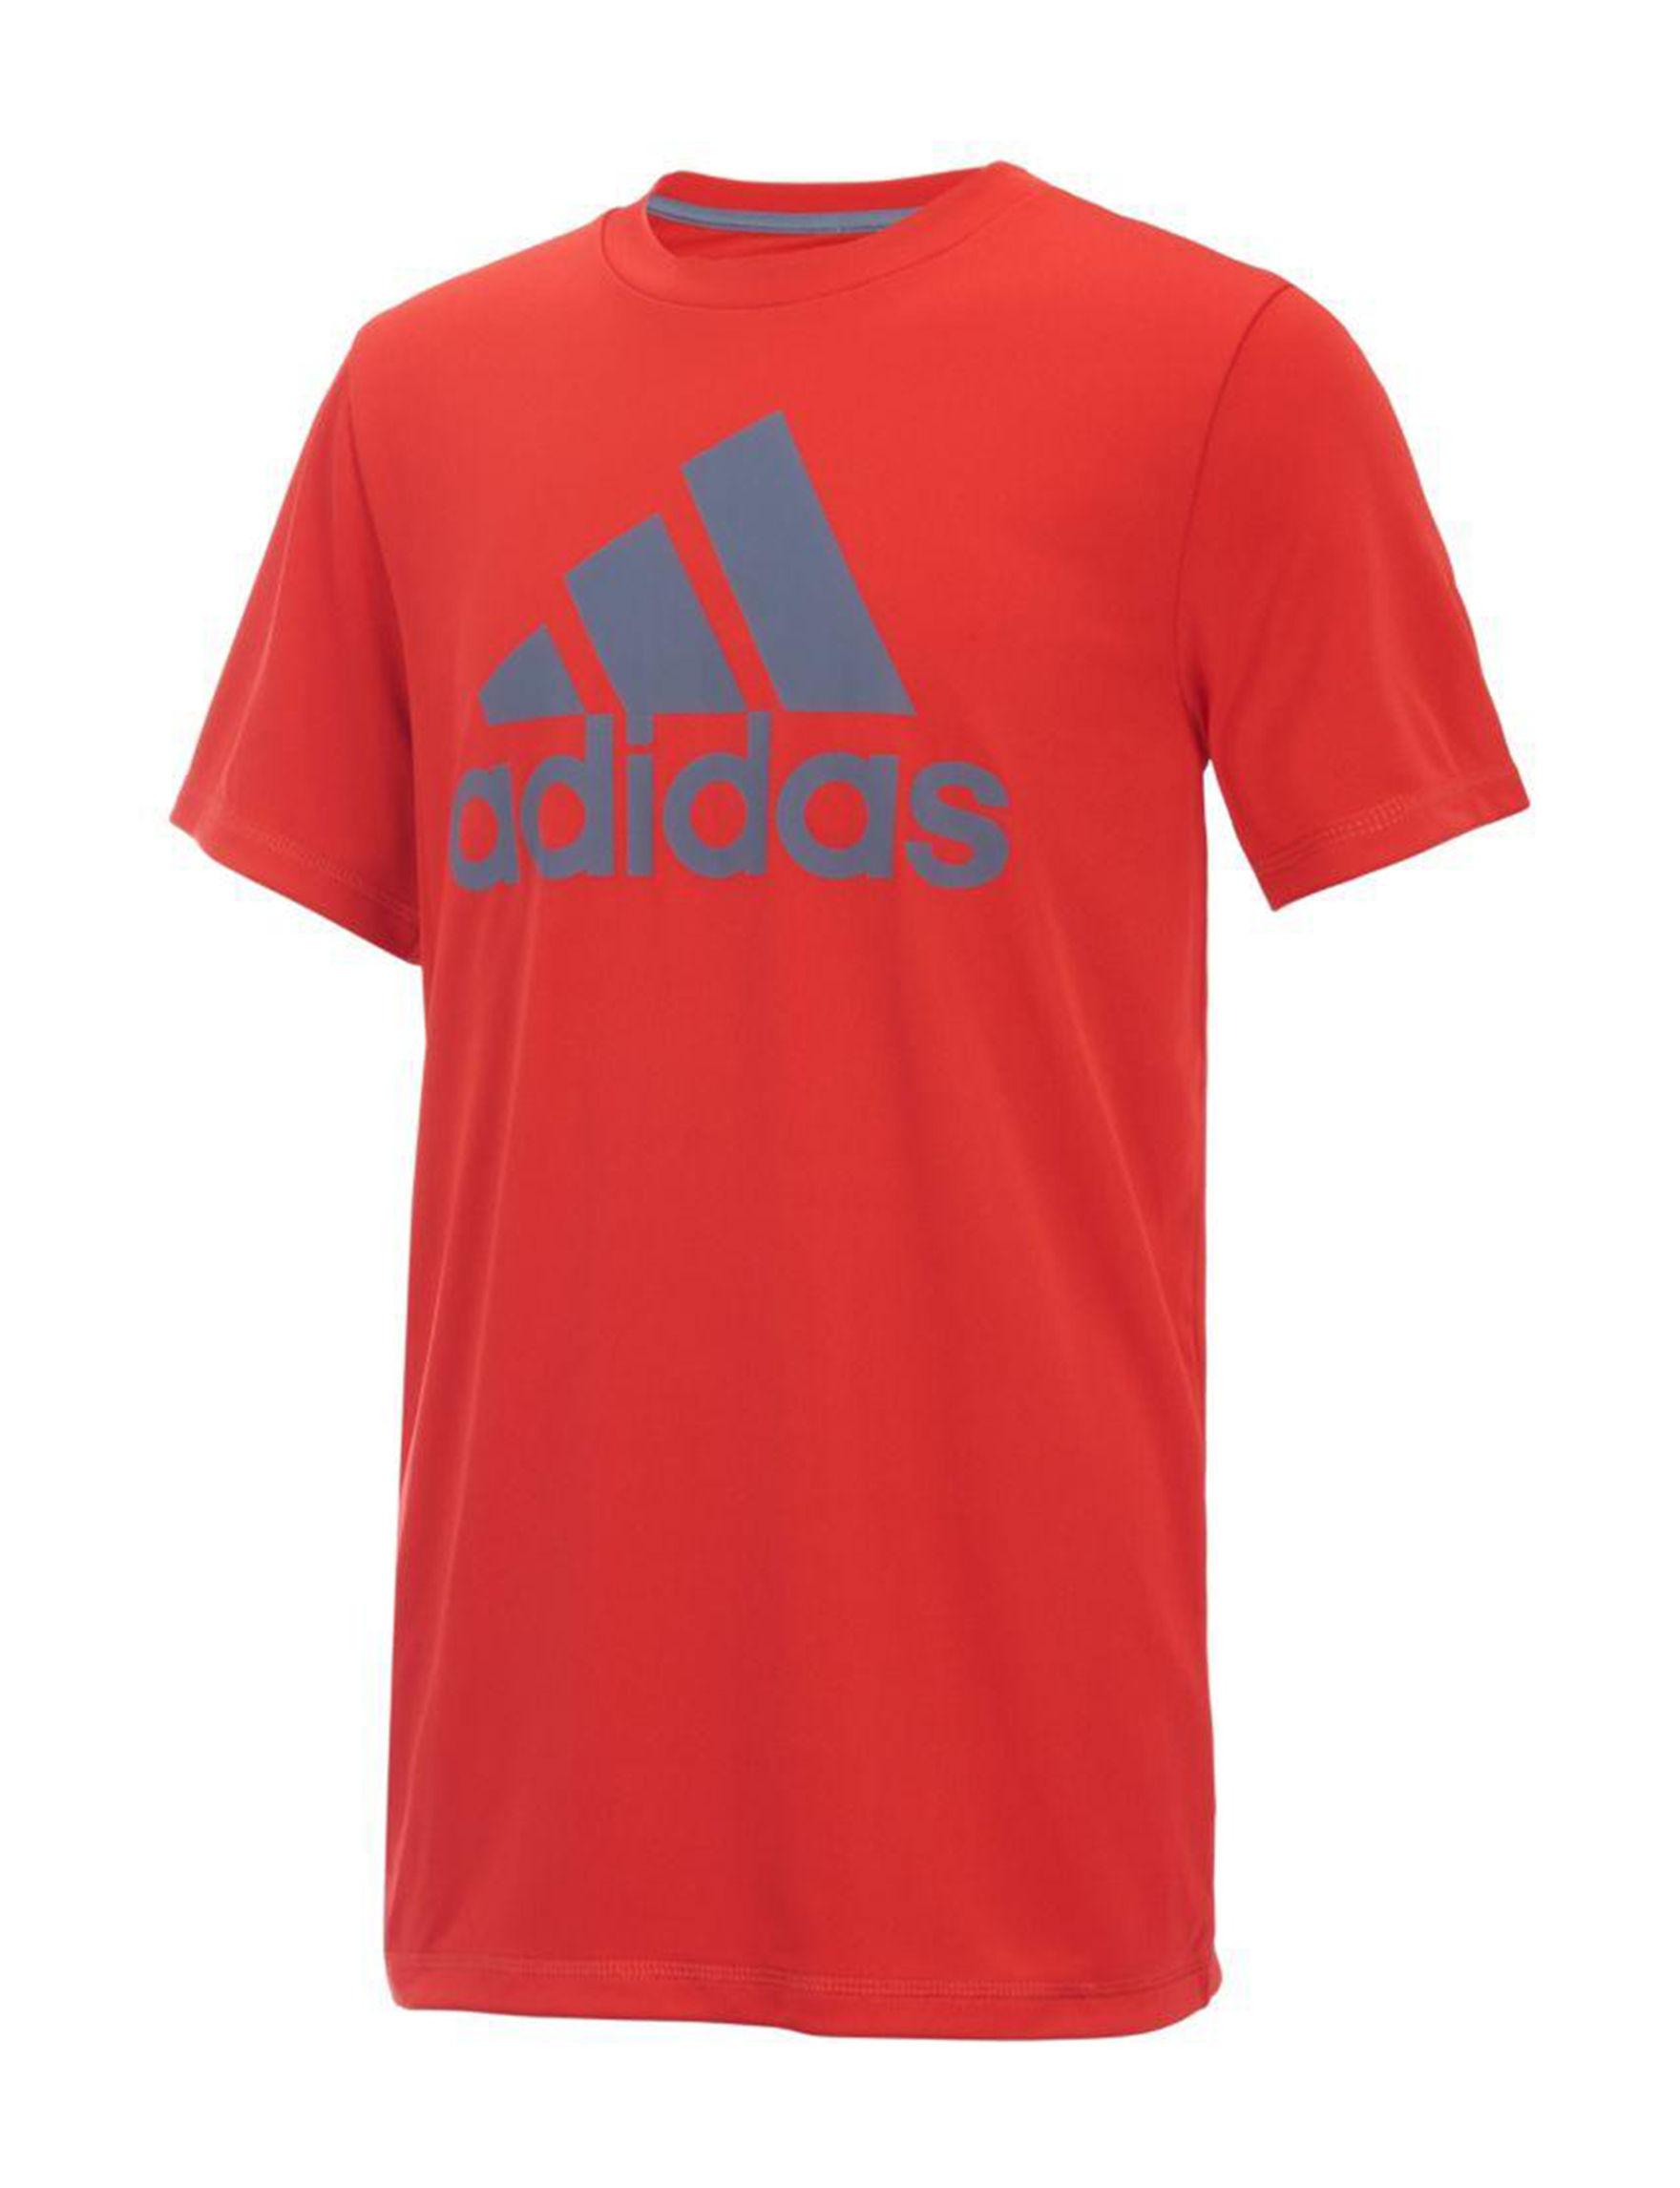 Adidas Red Tees & Tanks